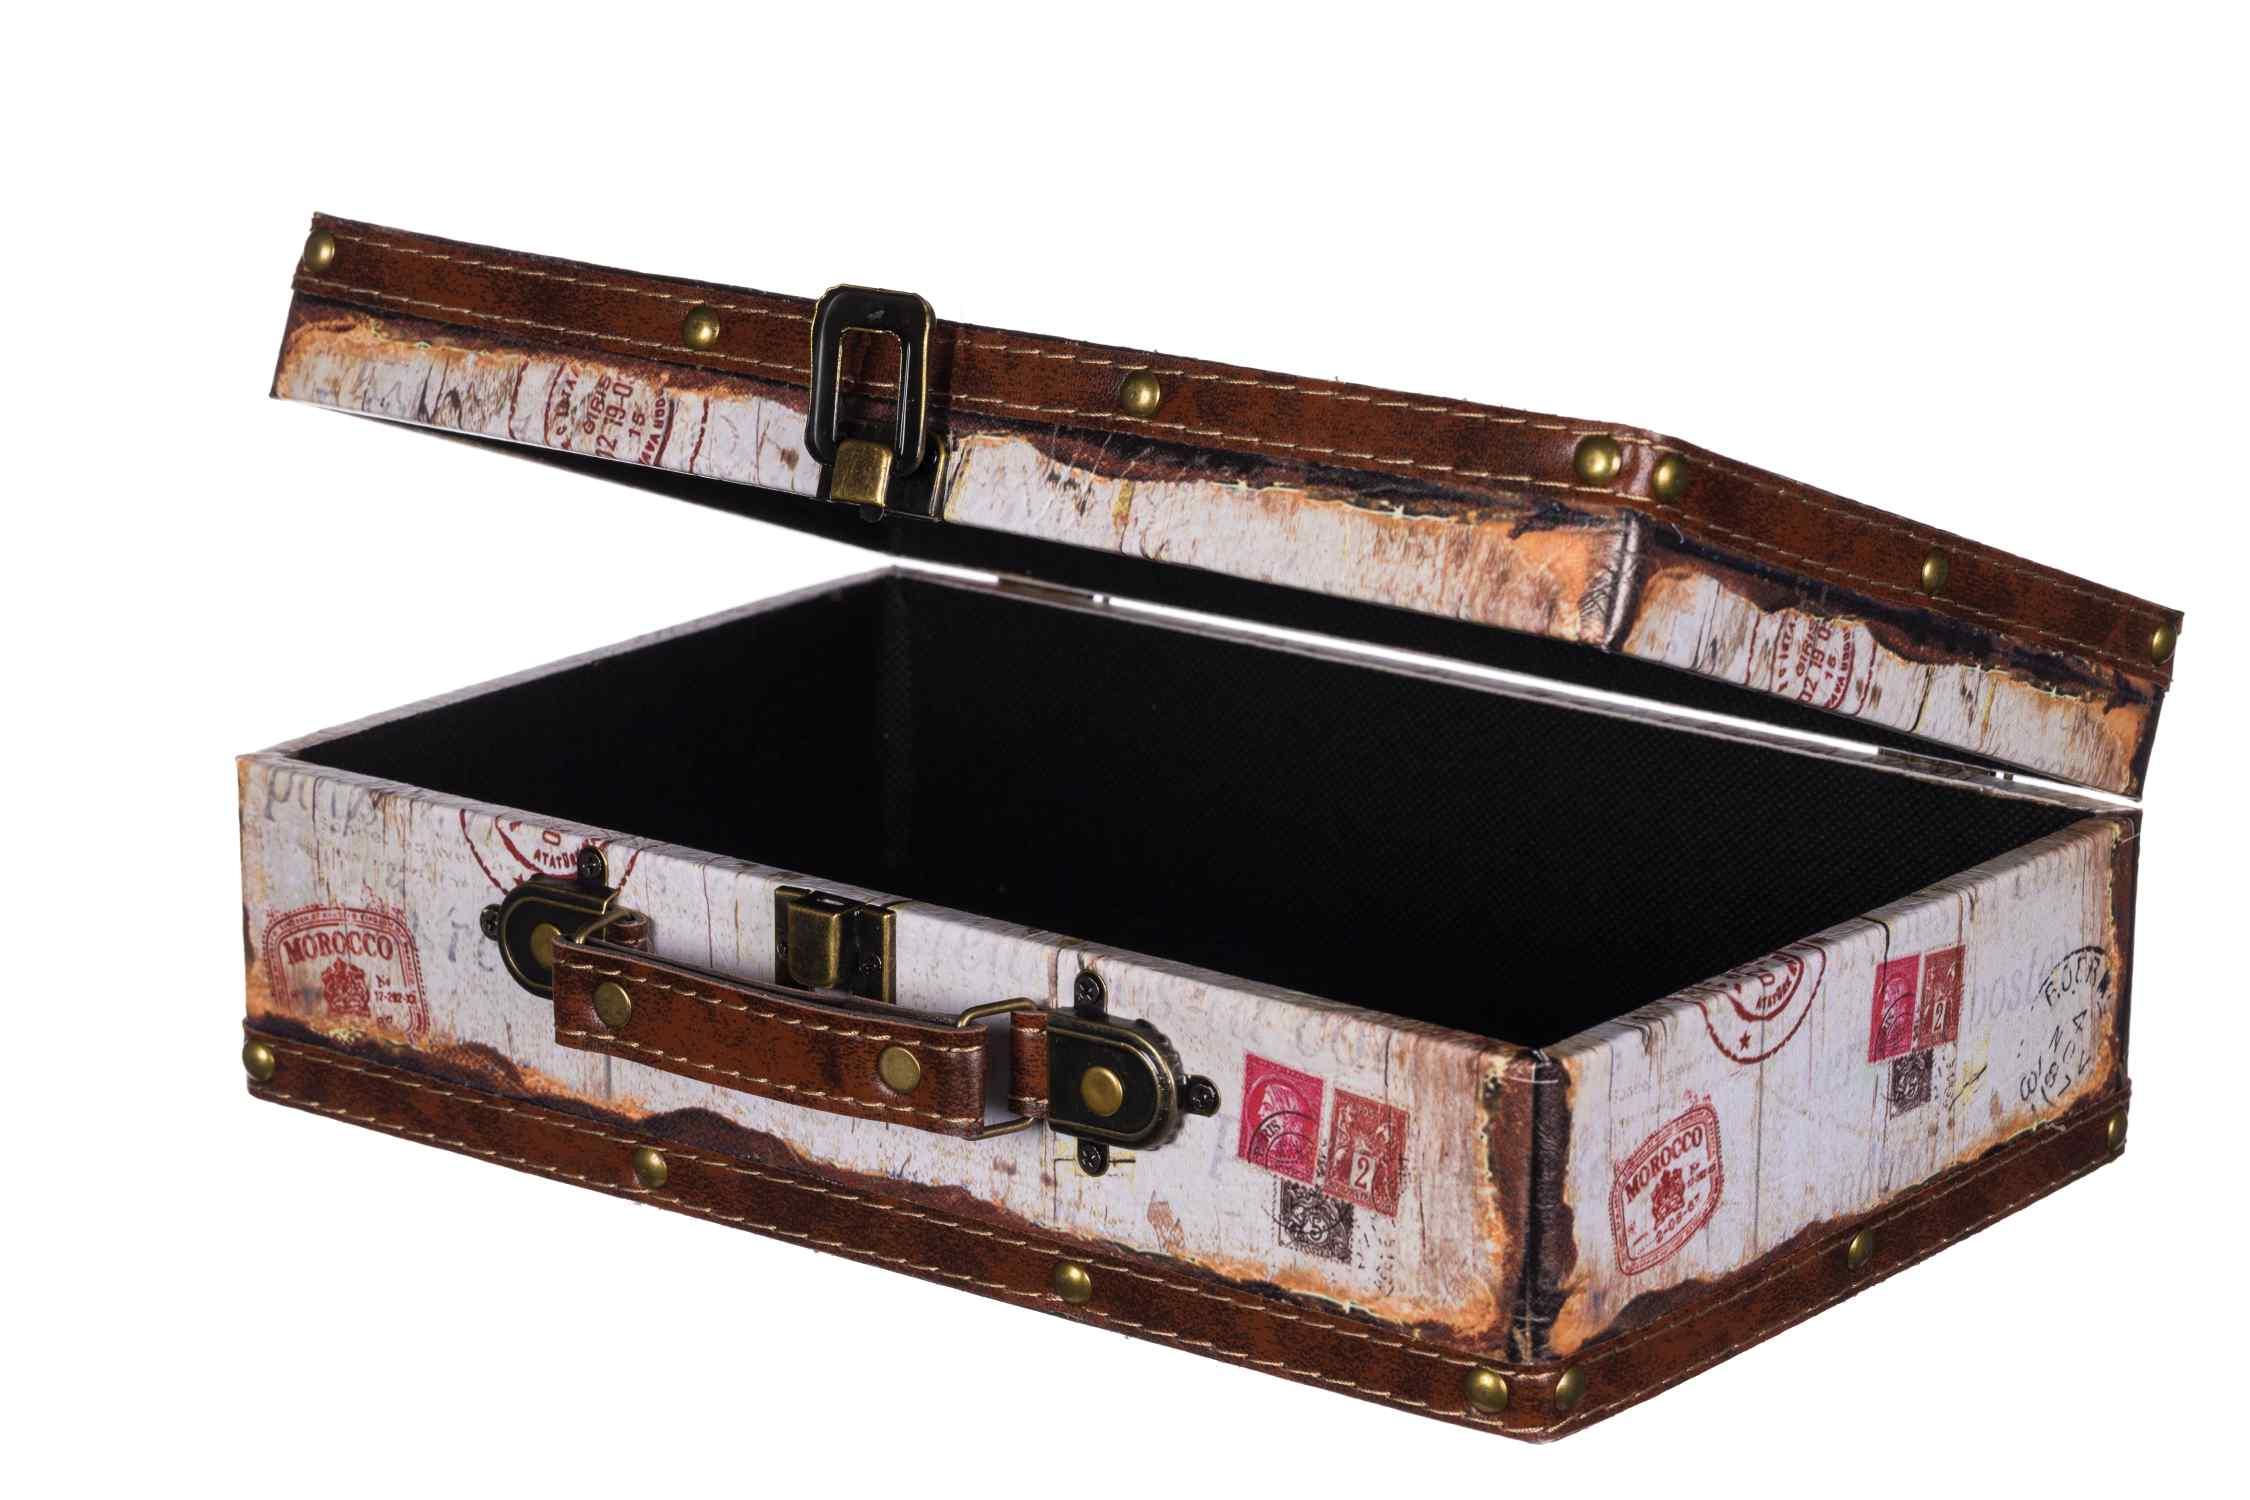 Gr/ö/ße L 49cmx28x25cm Orange Truhe Kiste SJ14307 Krone K/önigin England Holztruhe mit Kunstleder bezogen im Vintage Look Schatzkiste Piratenkiste Metallbeschl/äge koloniale Holzbox mit Ornamenten